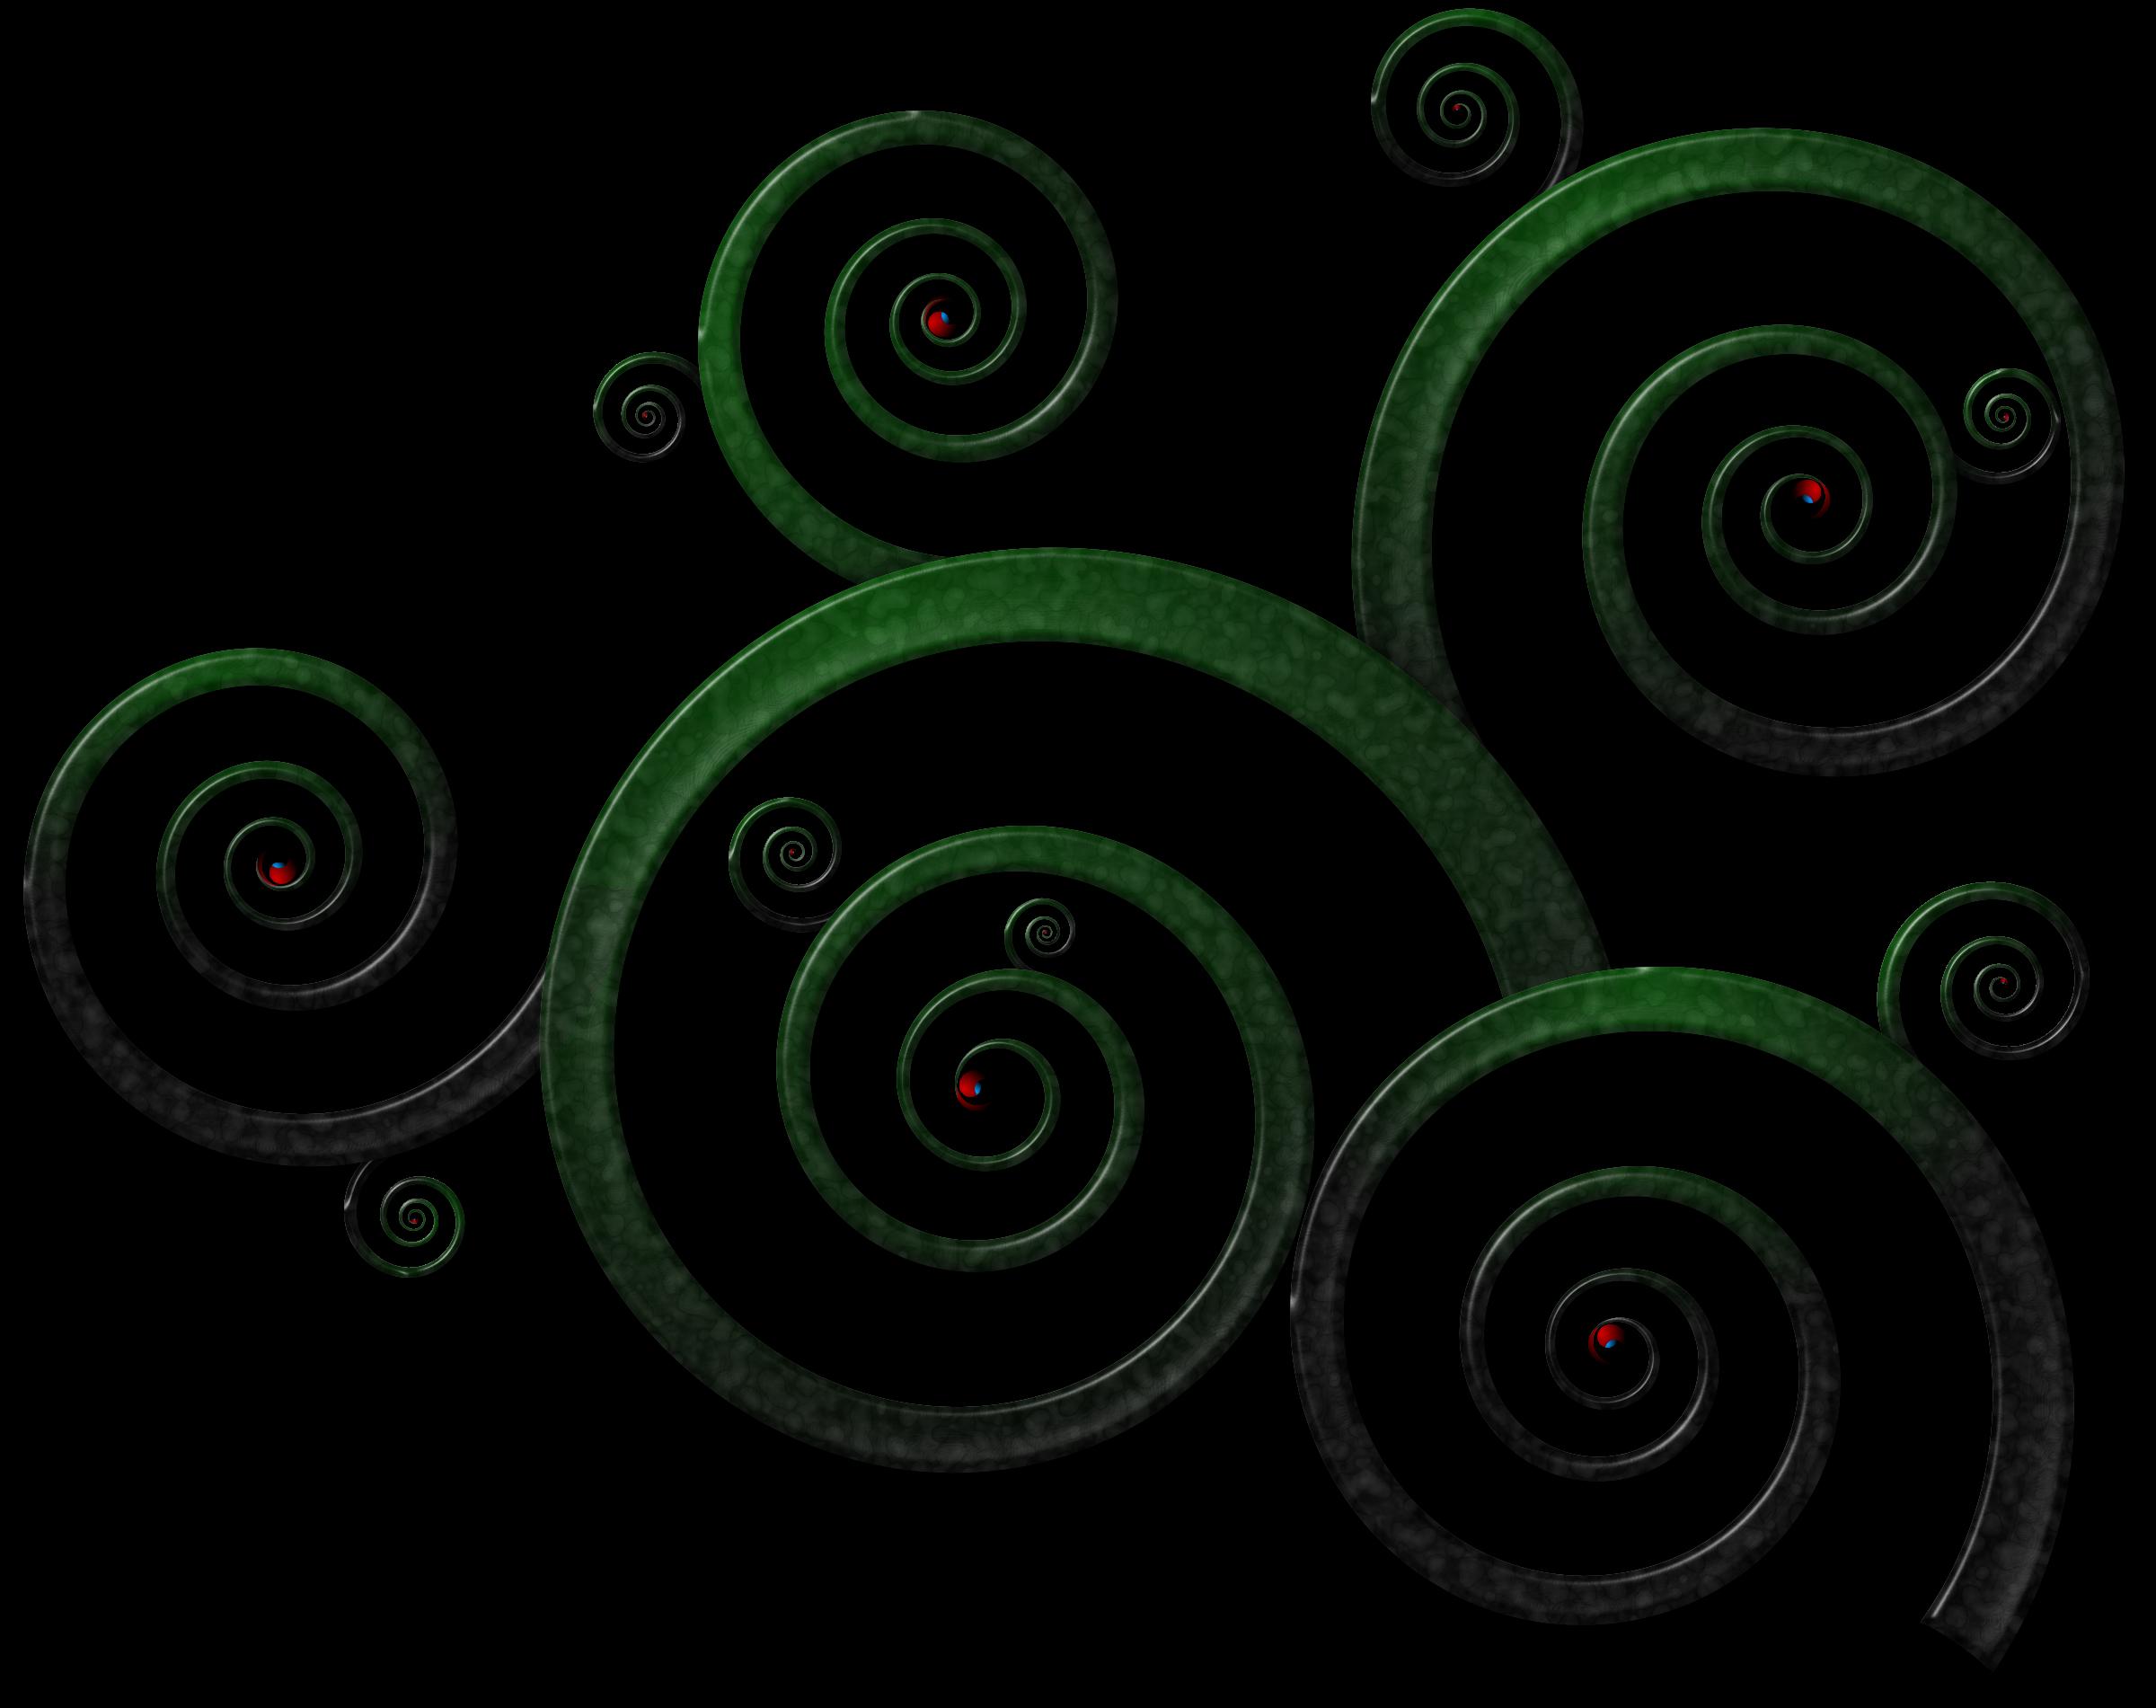 Clipart design curly. Vines big image png